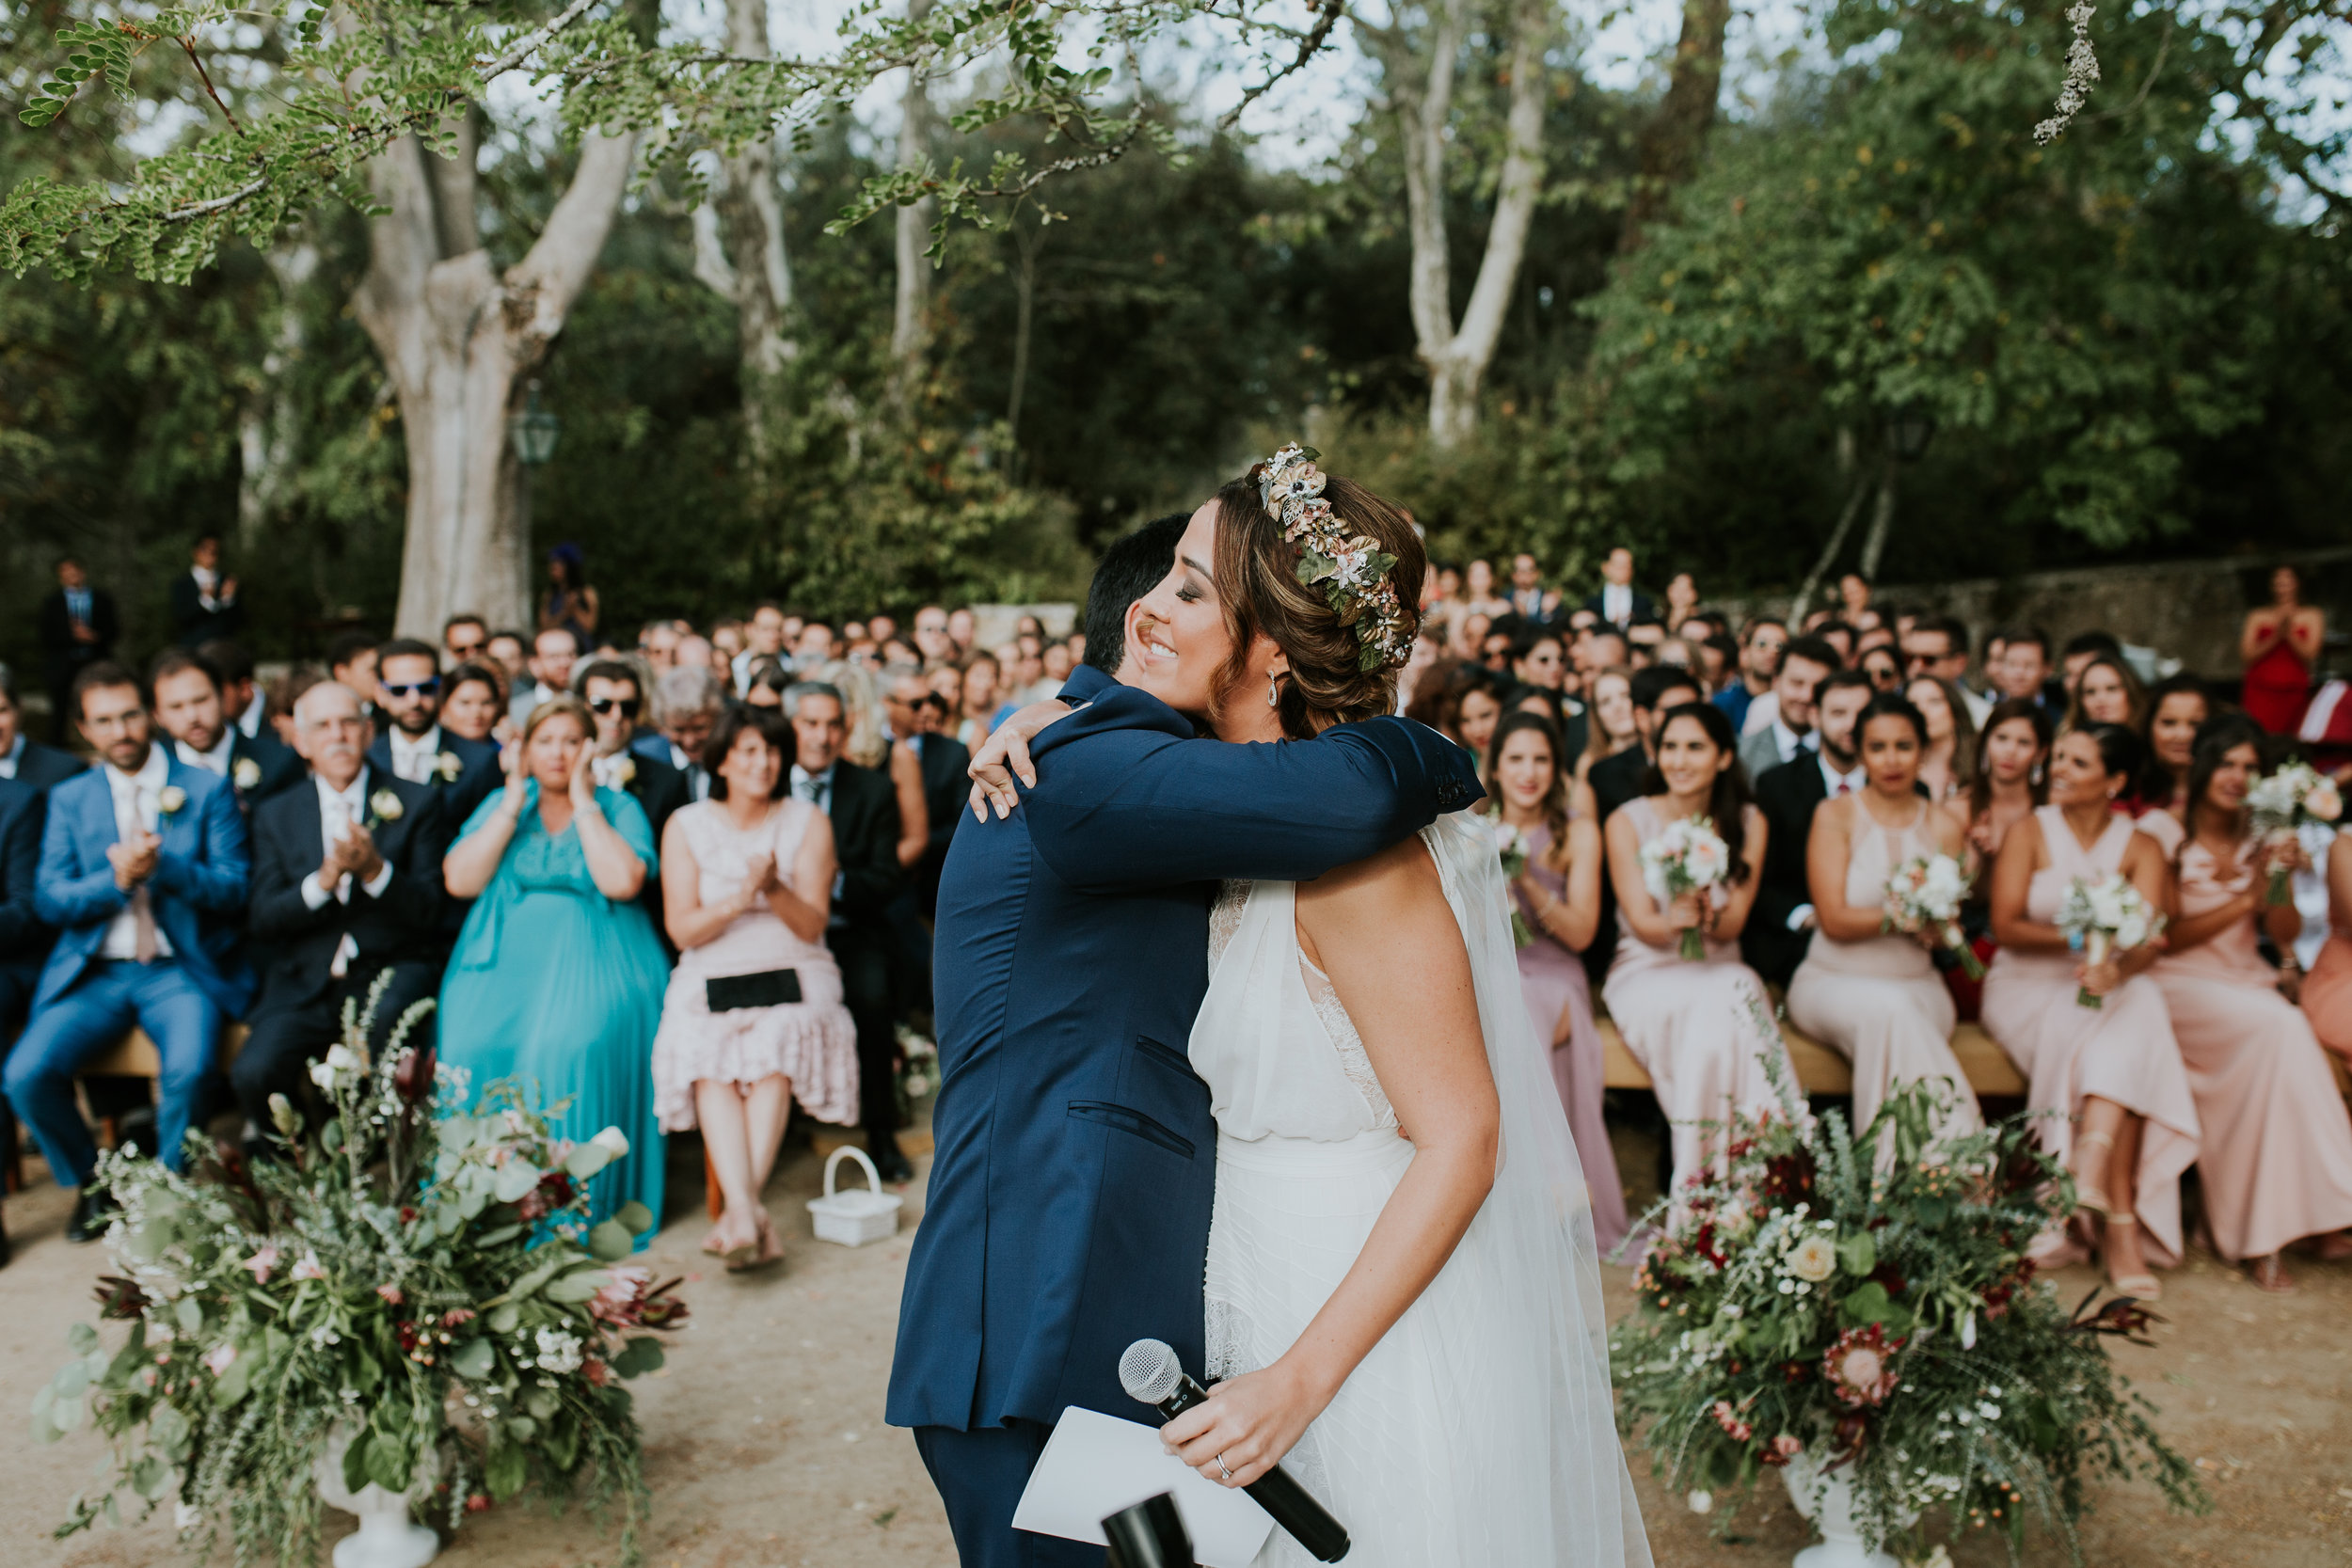 R&J307_ 09 setembro 2017 Wedding day_.jpg